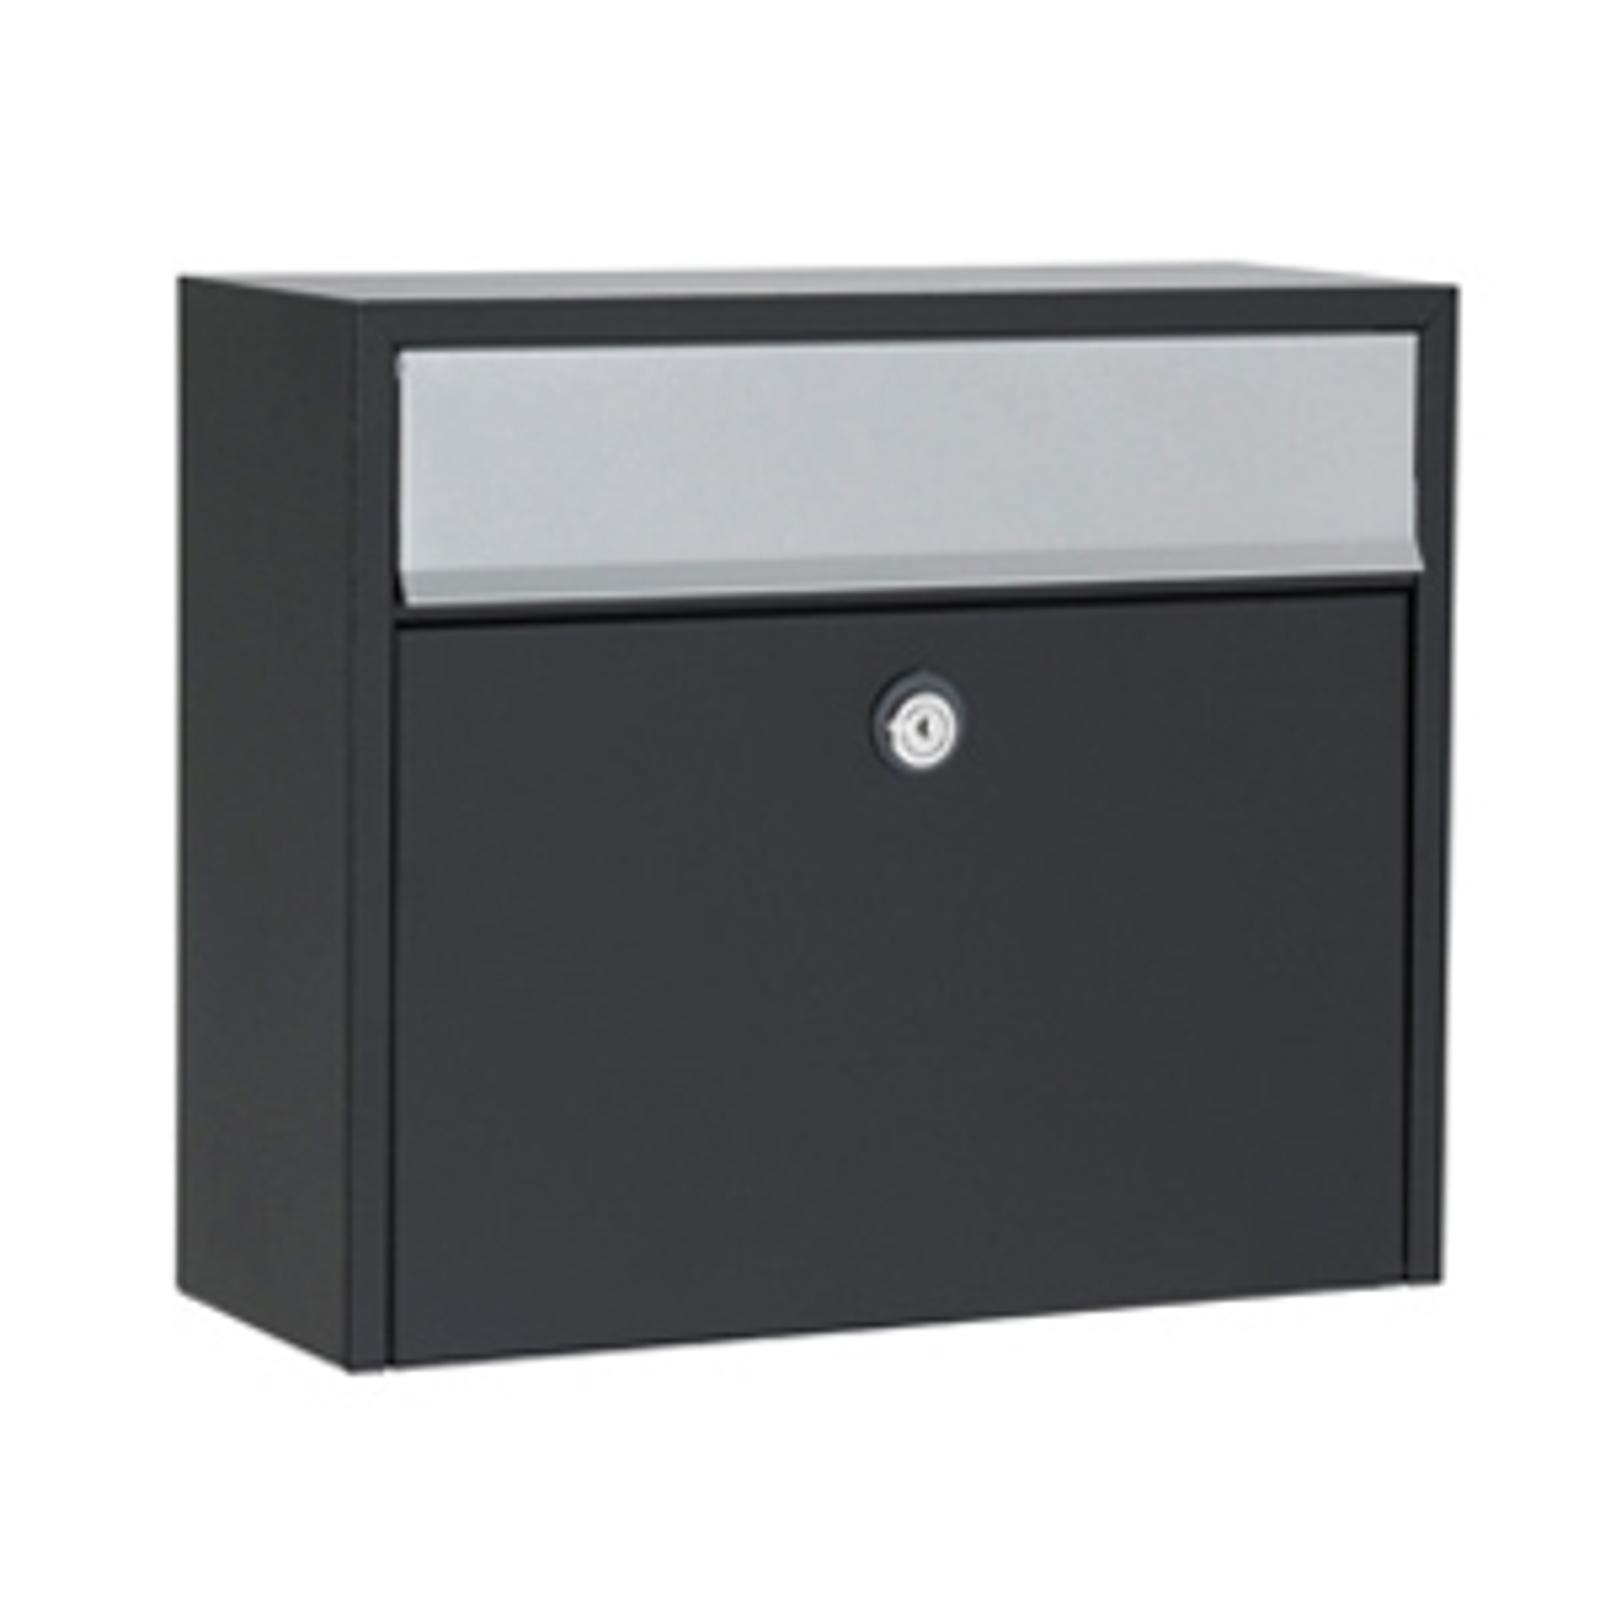 Enkel postkasse LT150, svart med Euro-lås